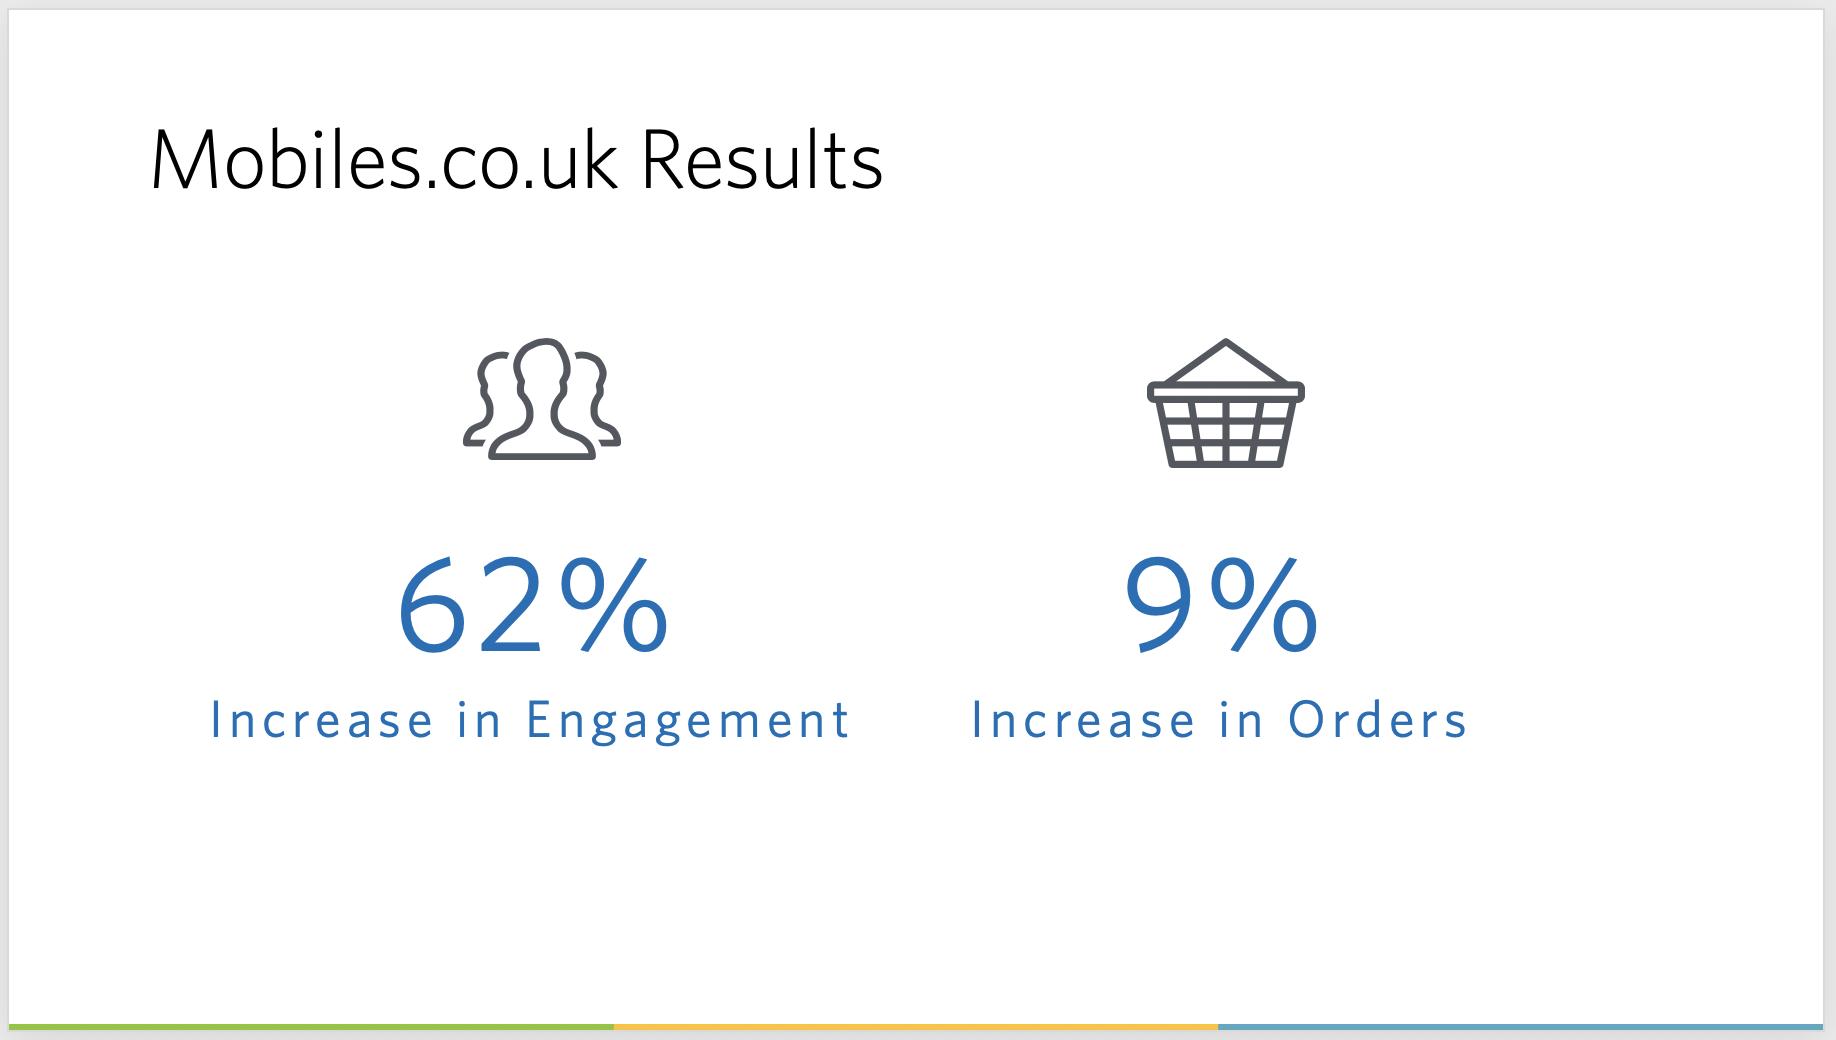 Mobiles.co.uk presentation results